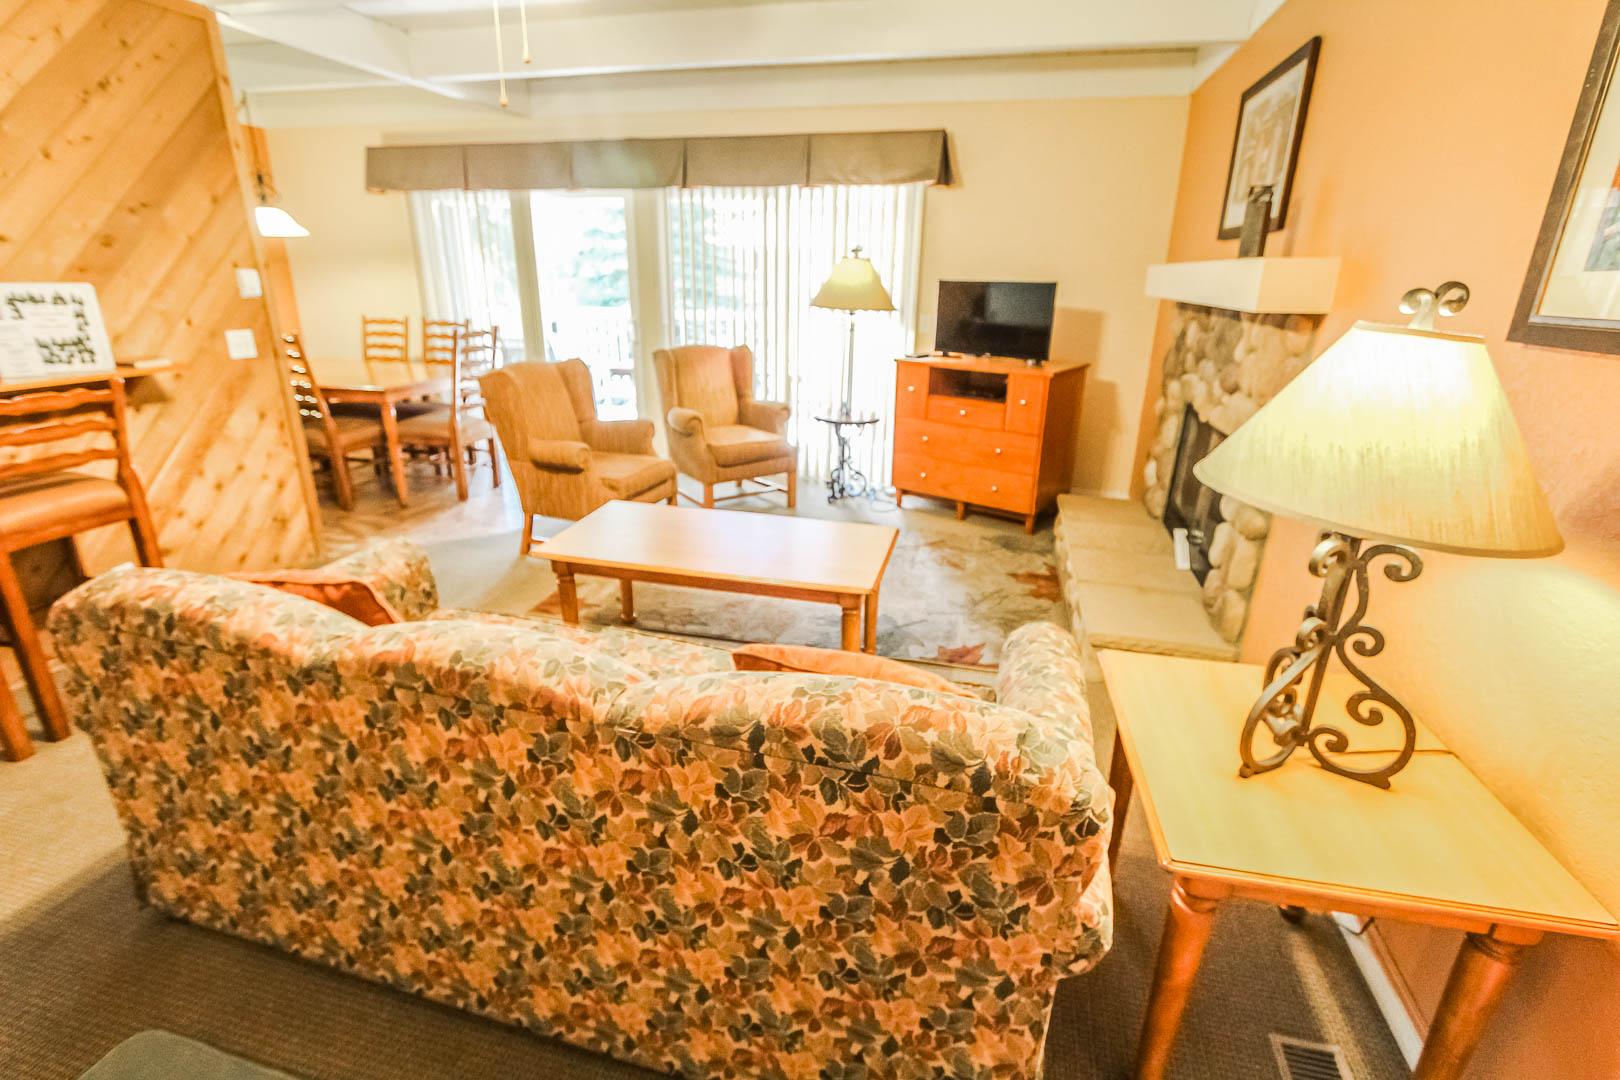 A vibrant living room area at VRI's Lake Arrowhead Chalets in California.